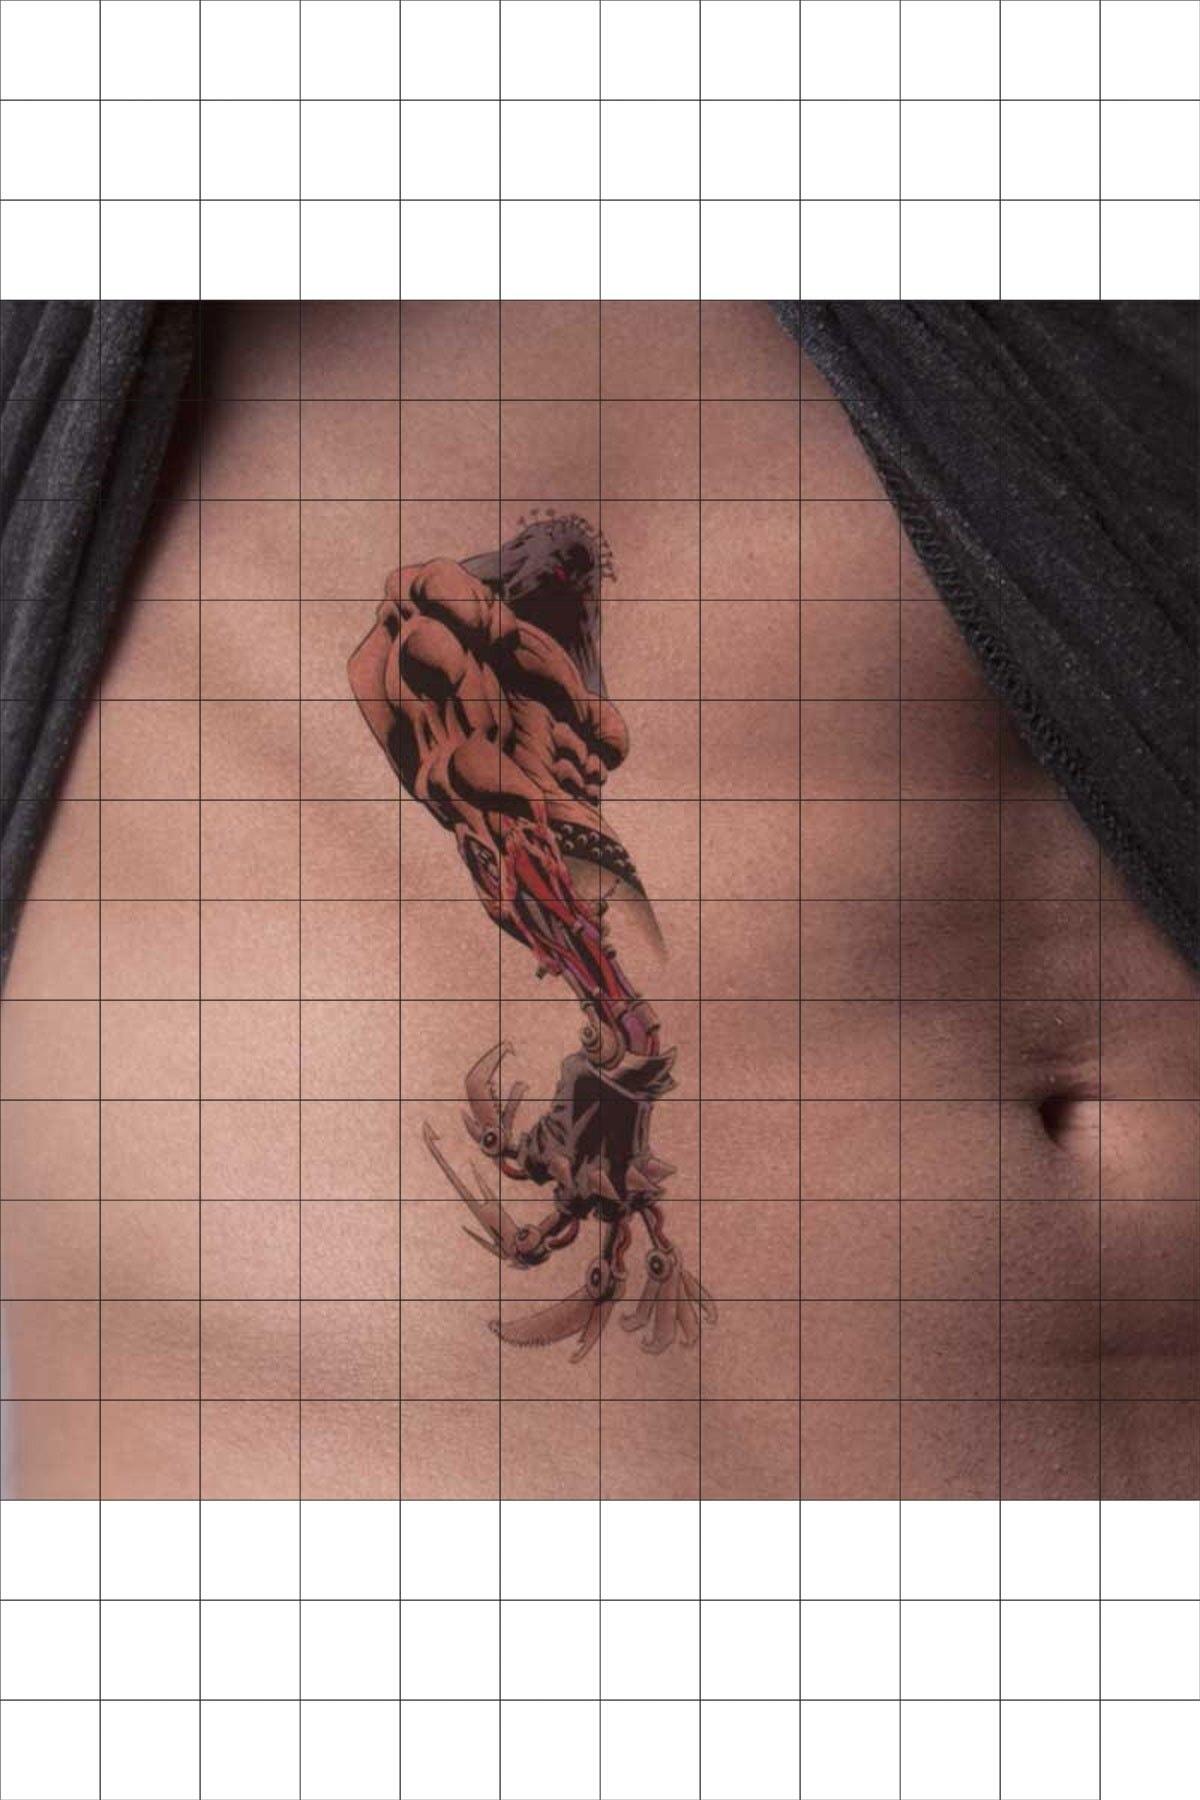 TatFast Biyomekanik 126 Geçici Dövme Flash Tattoo 1